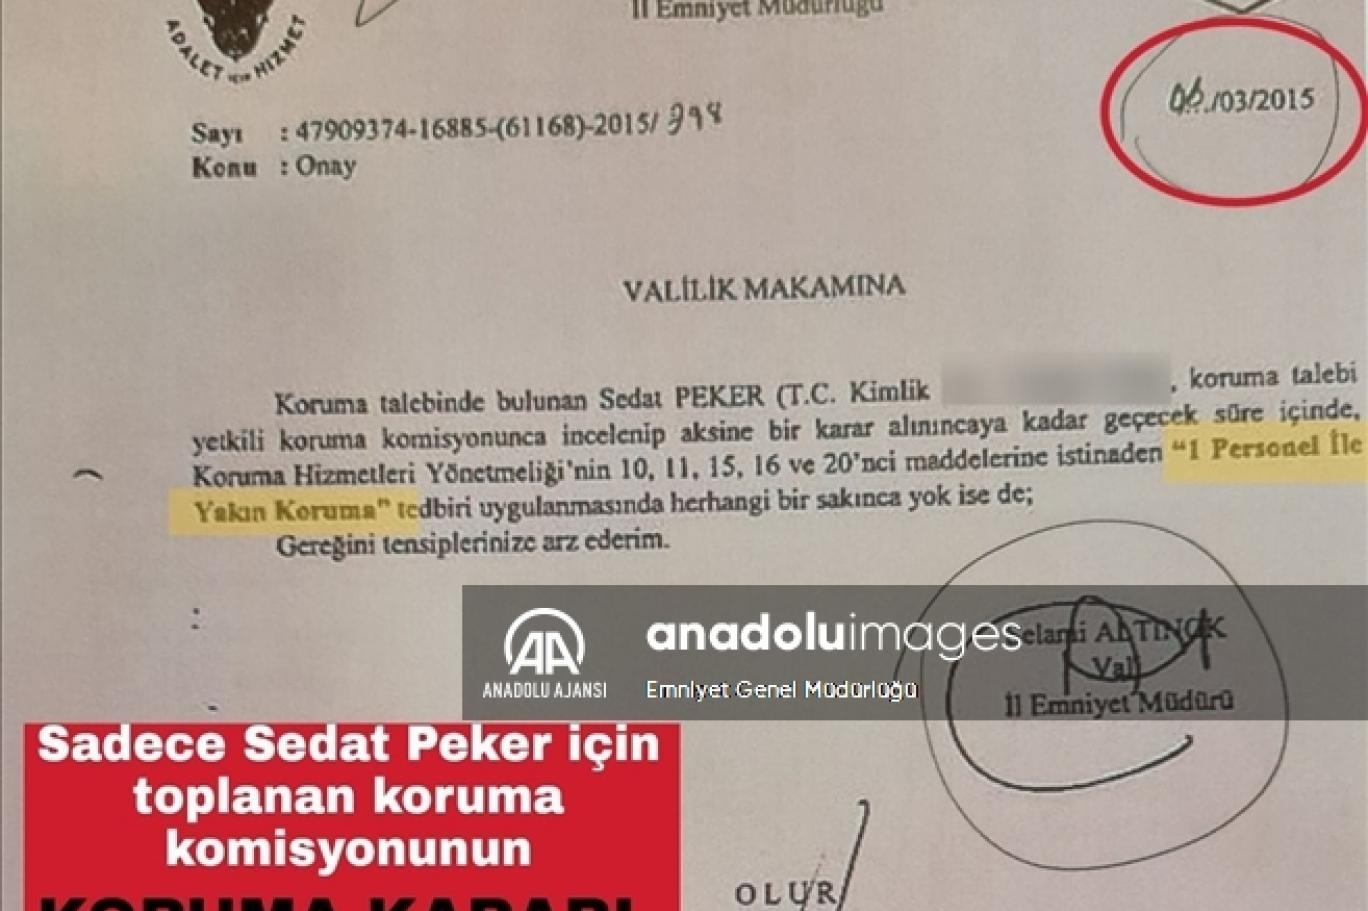 AKP'li vekilden AA'ya çok ağır sözler!.. - Gazikent27